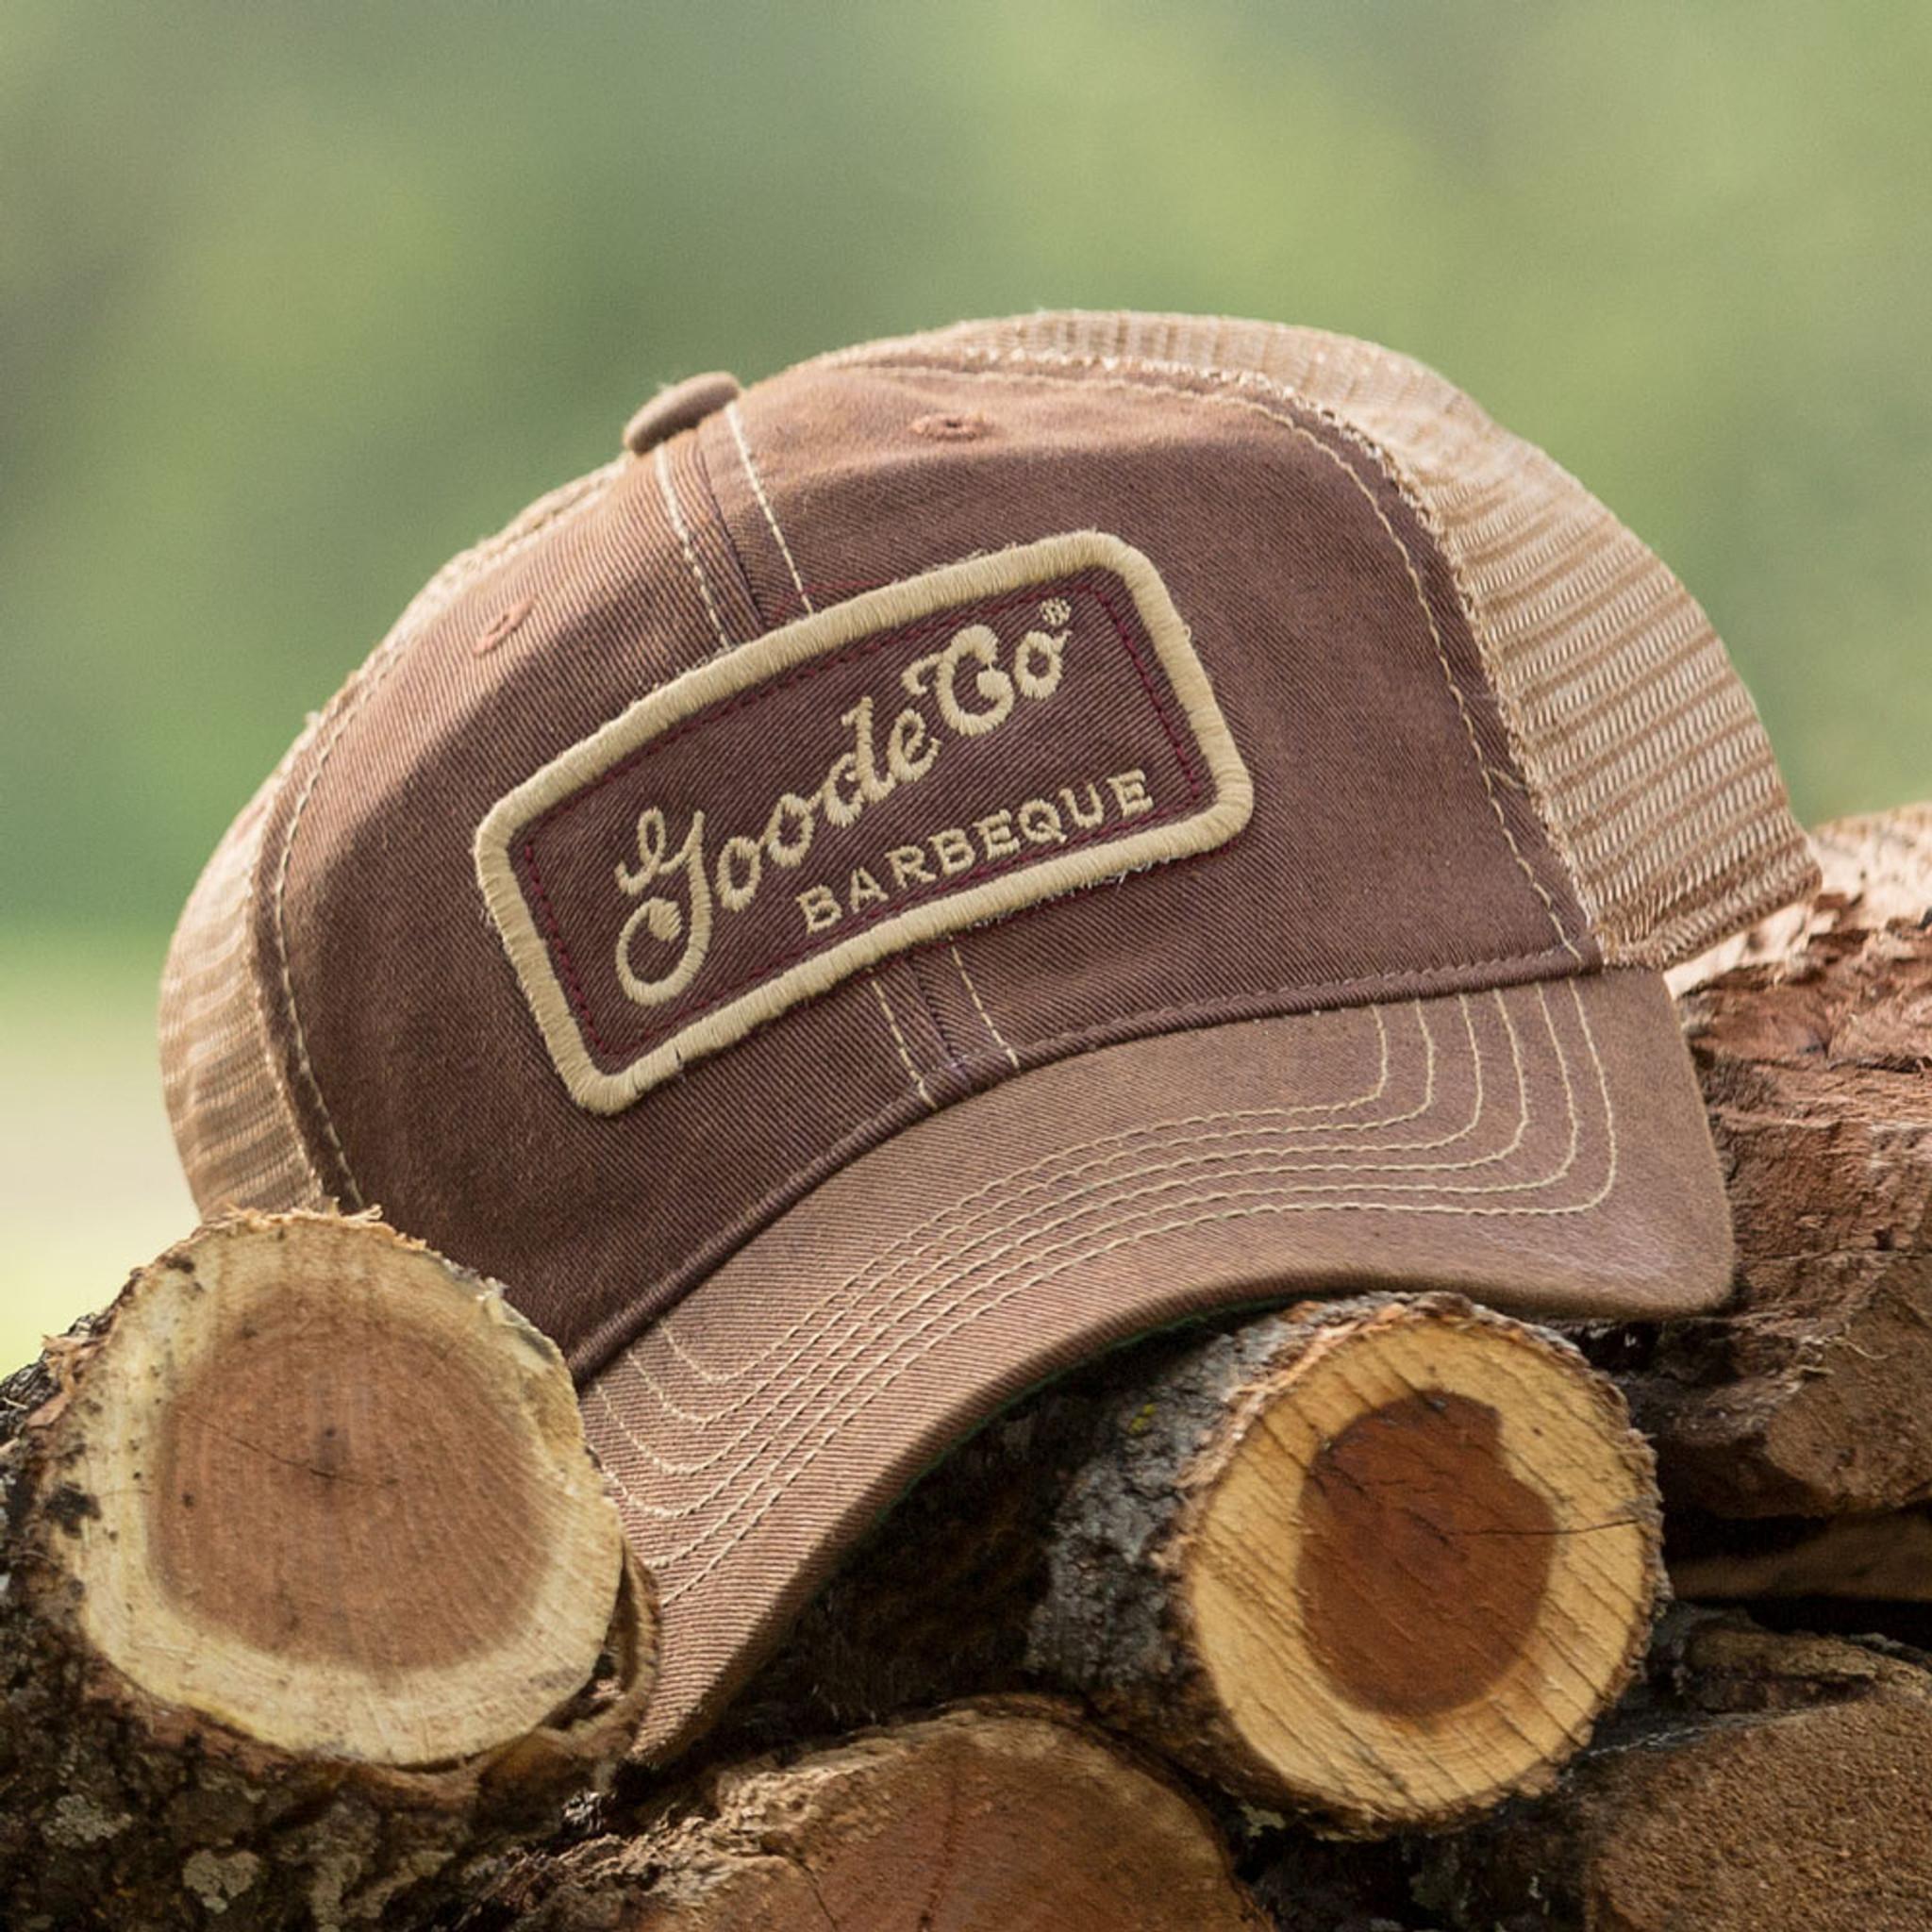 Goode Co's vintage-looking burgundy trucker hat resting on Texas mesquite wood.